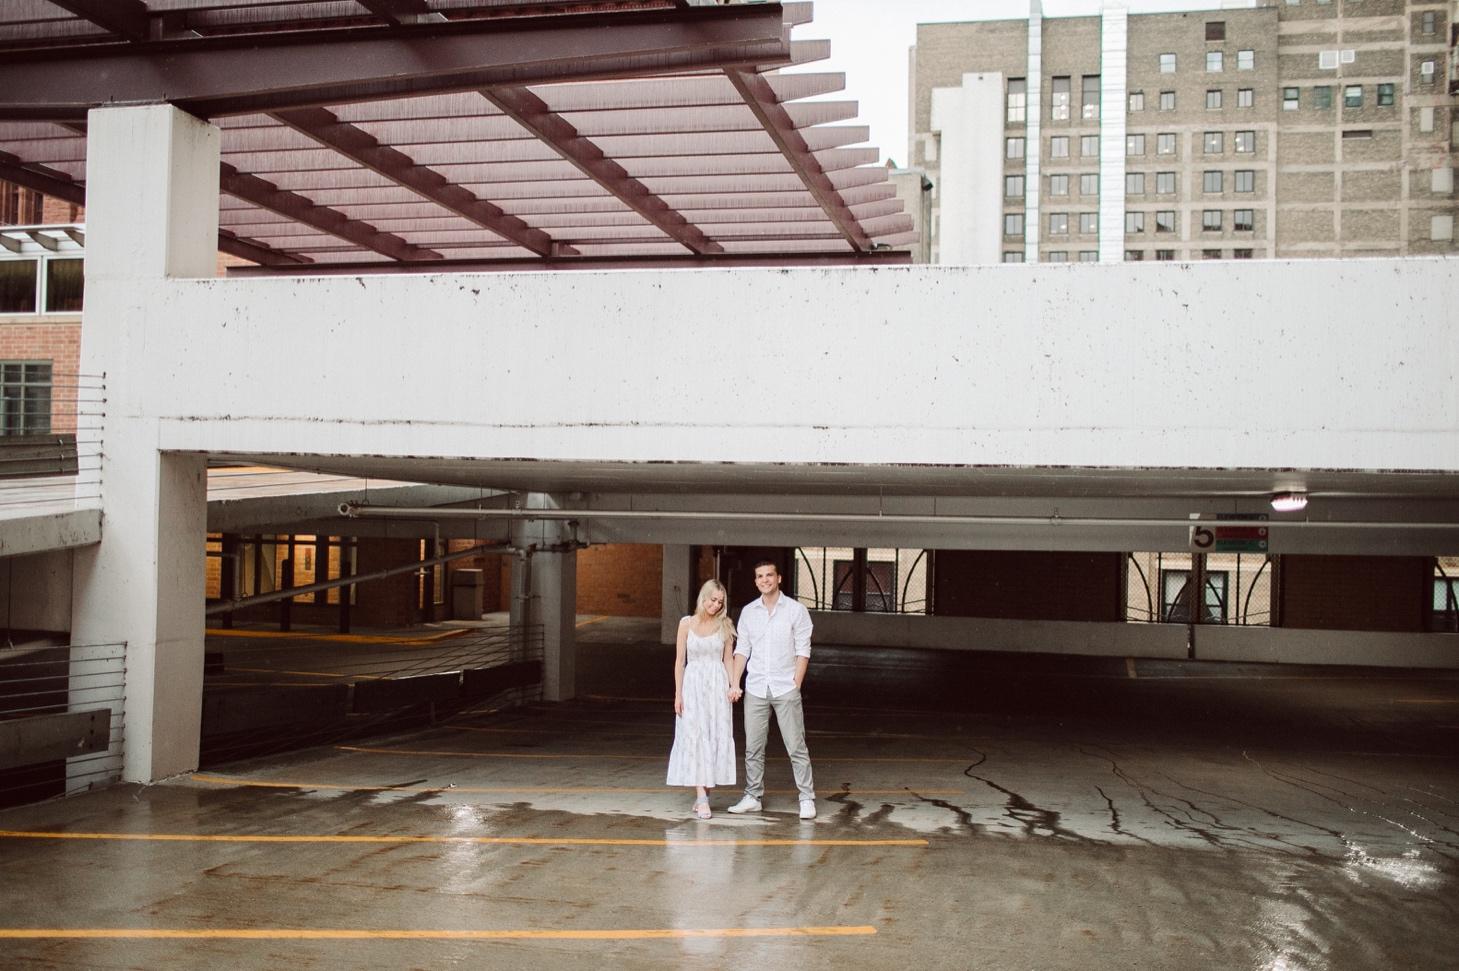 23_engagements-89_urbanphotography_stpaulphotos,_mnweddingphotographer,_kileymarissaphotography,_stpaulengagement,_stpaulminnesota_kileymarissa,_mnengagementphotos,.jpg